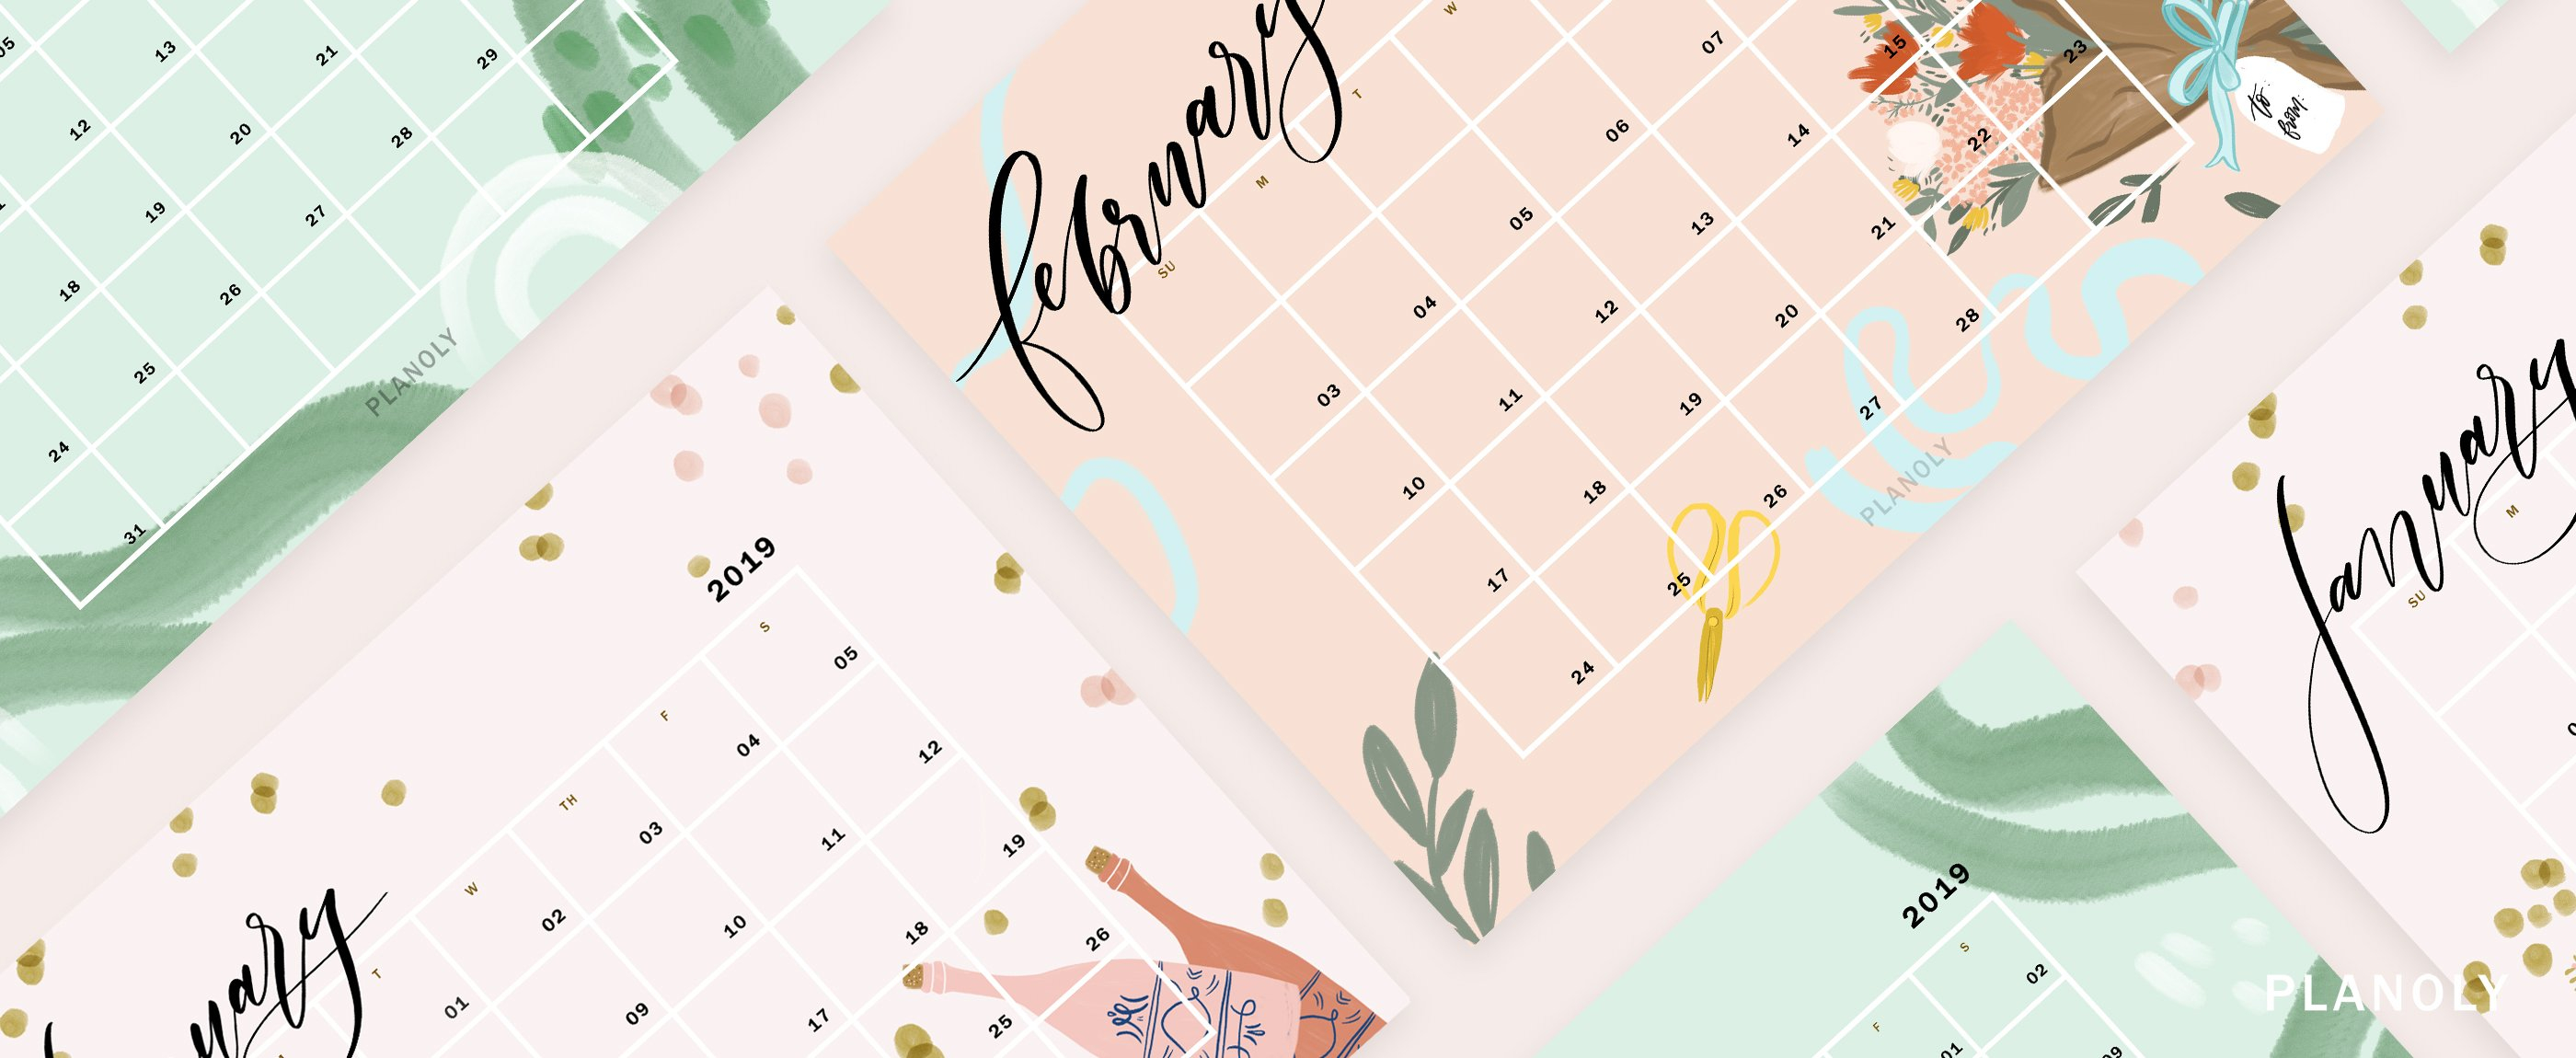 Q1 2019 Content Calendars – Planoly Calendar Q1 2019